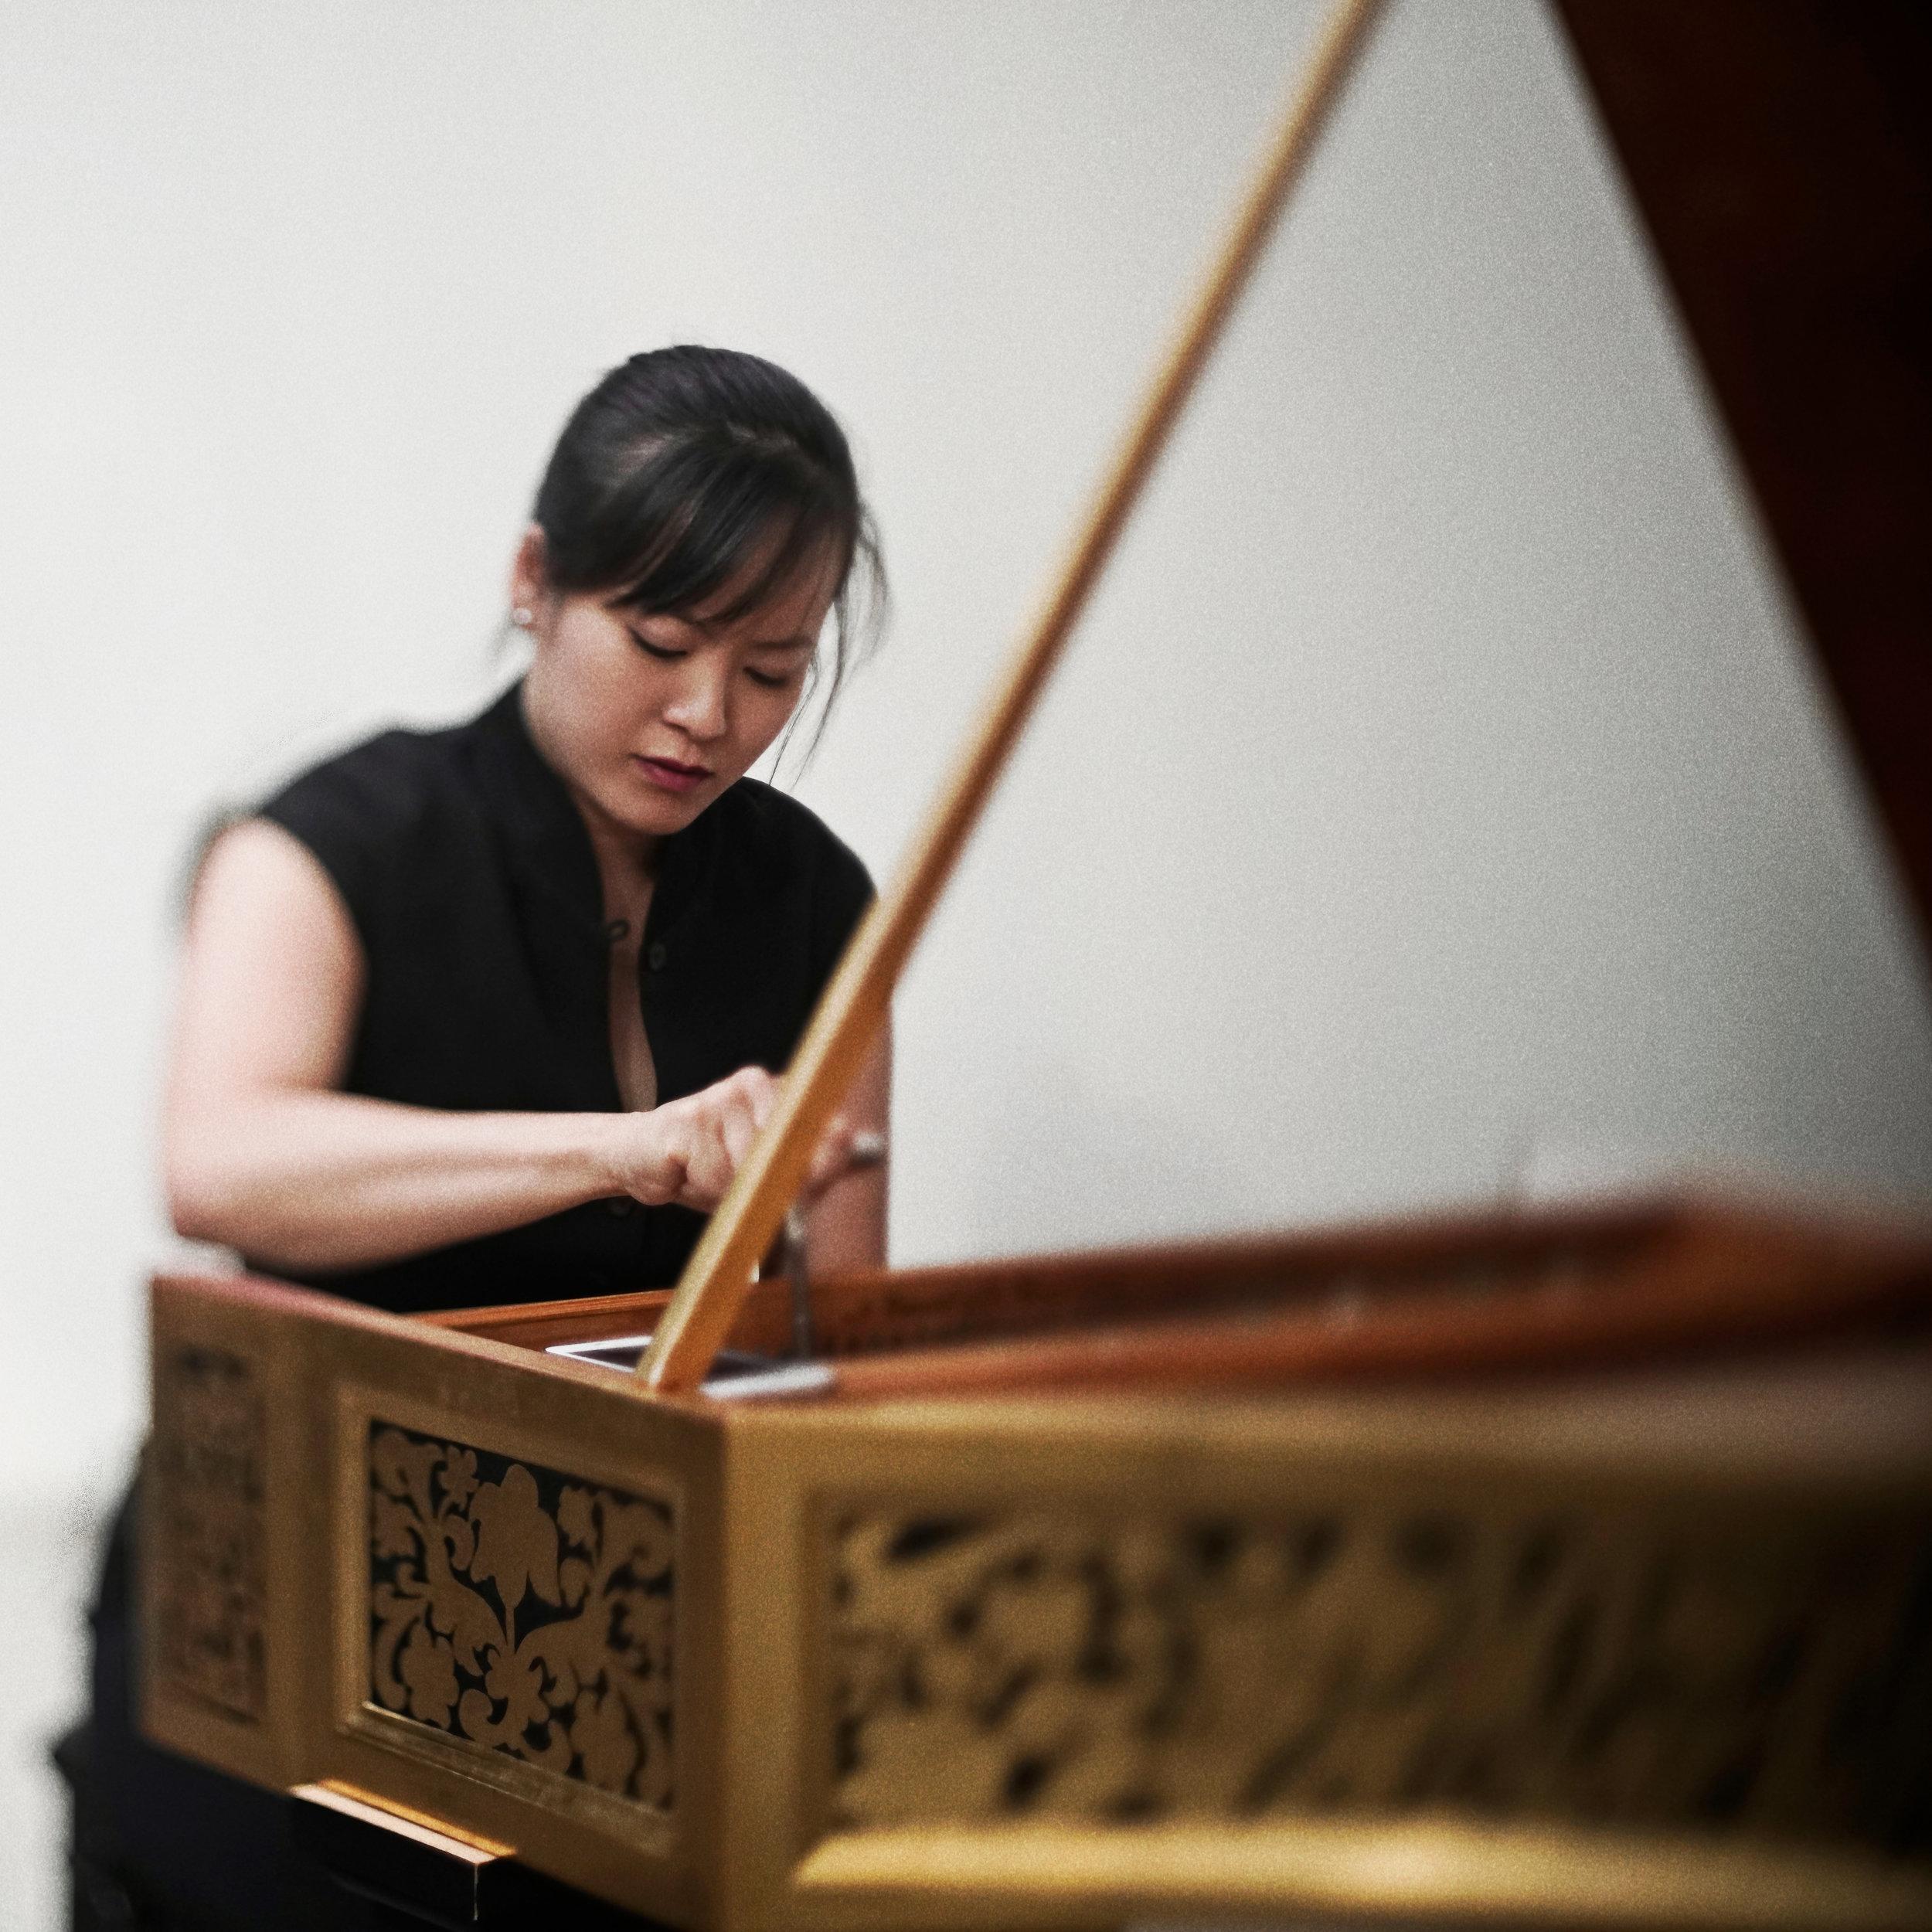 harpsichord_3_crop_intermediate_brighter_GIMP.JPG